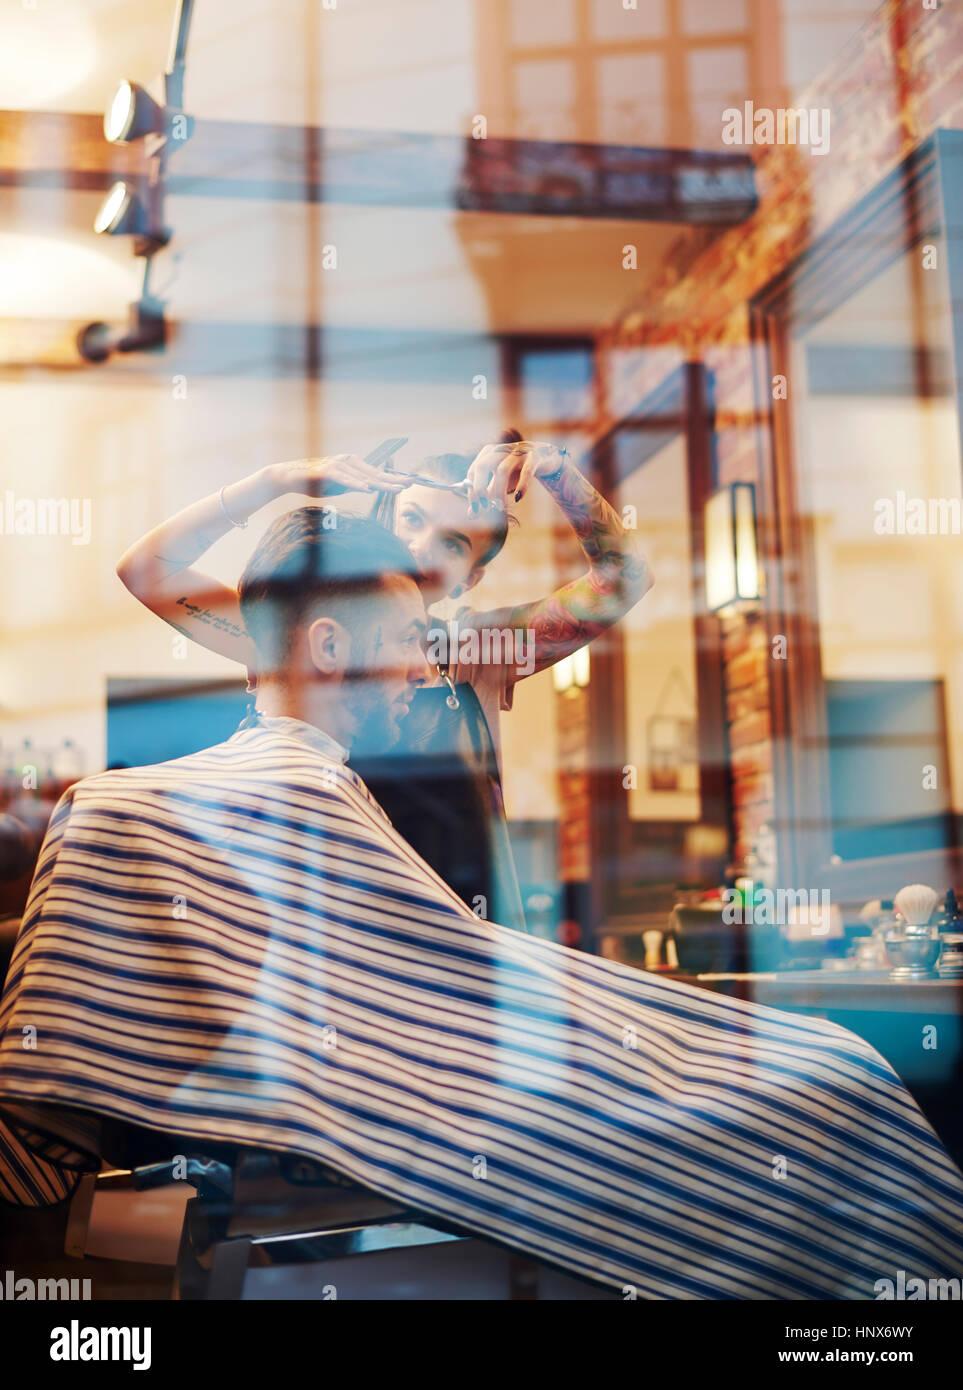 View through window of hairdresser cutting customer's hair Stock Photo